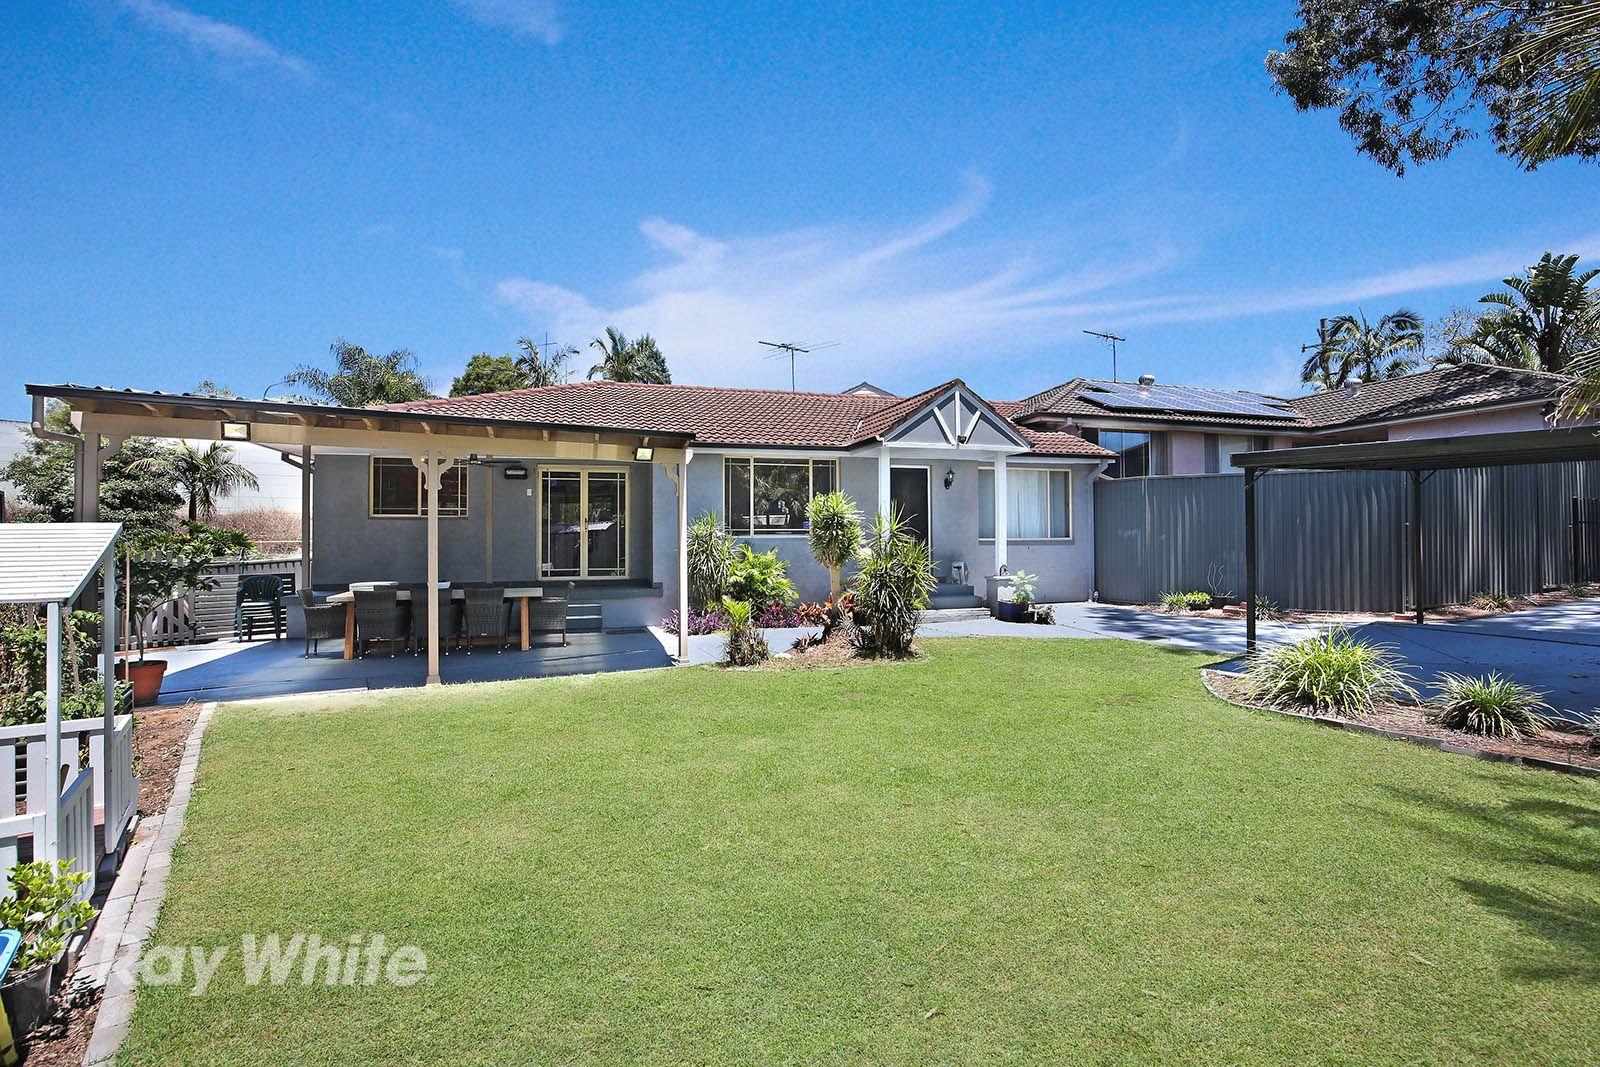 37A Valerie Avenue, Baulkham Hills NSW 2153, Image 0